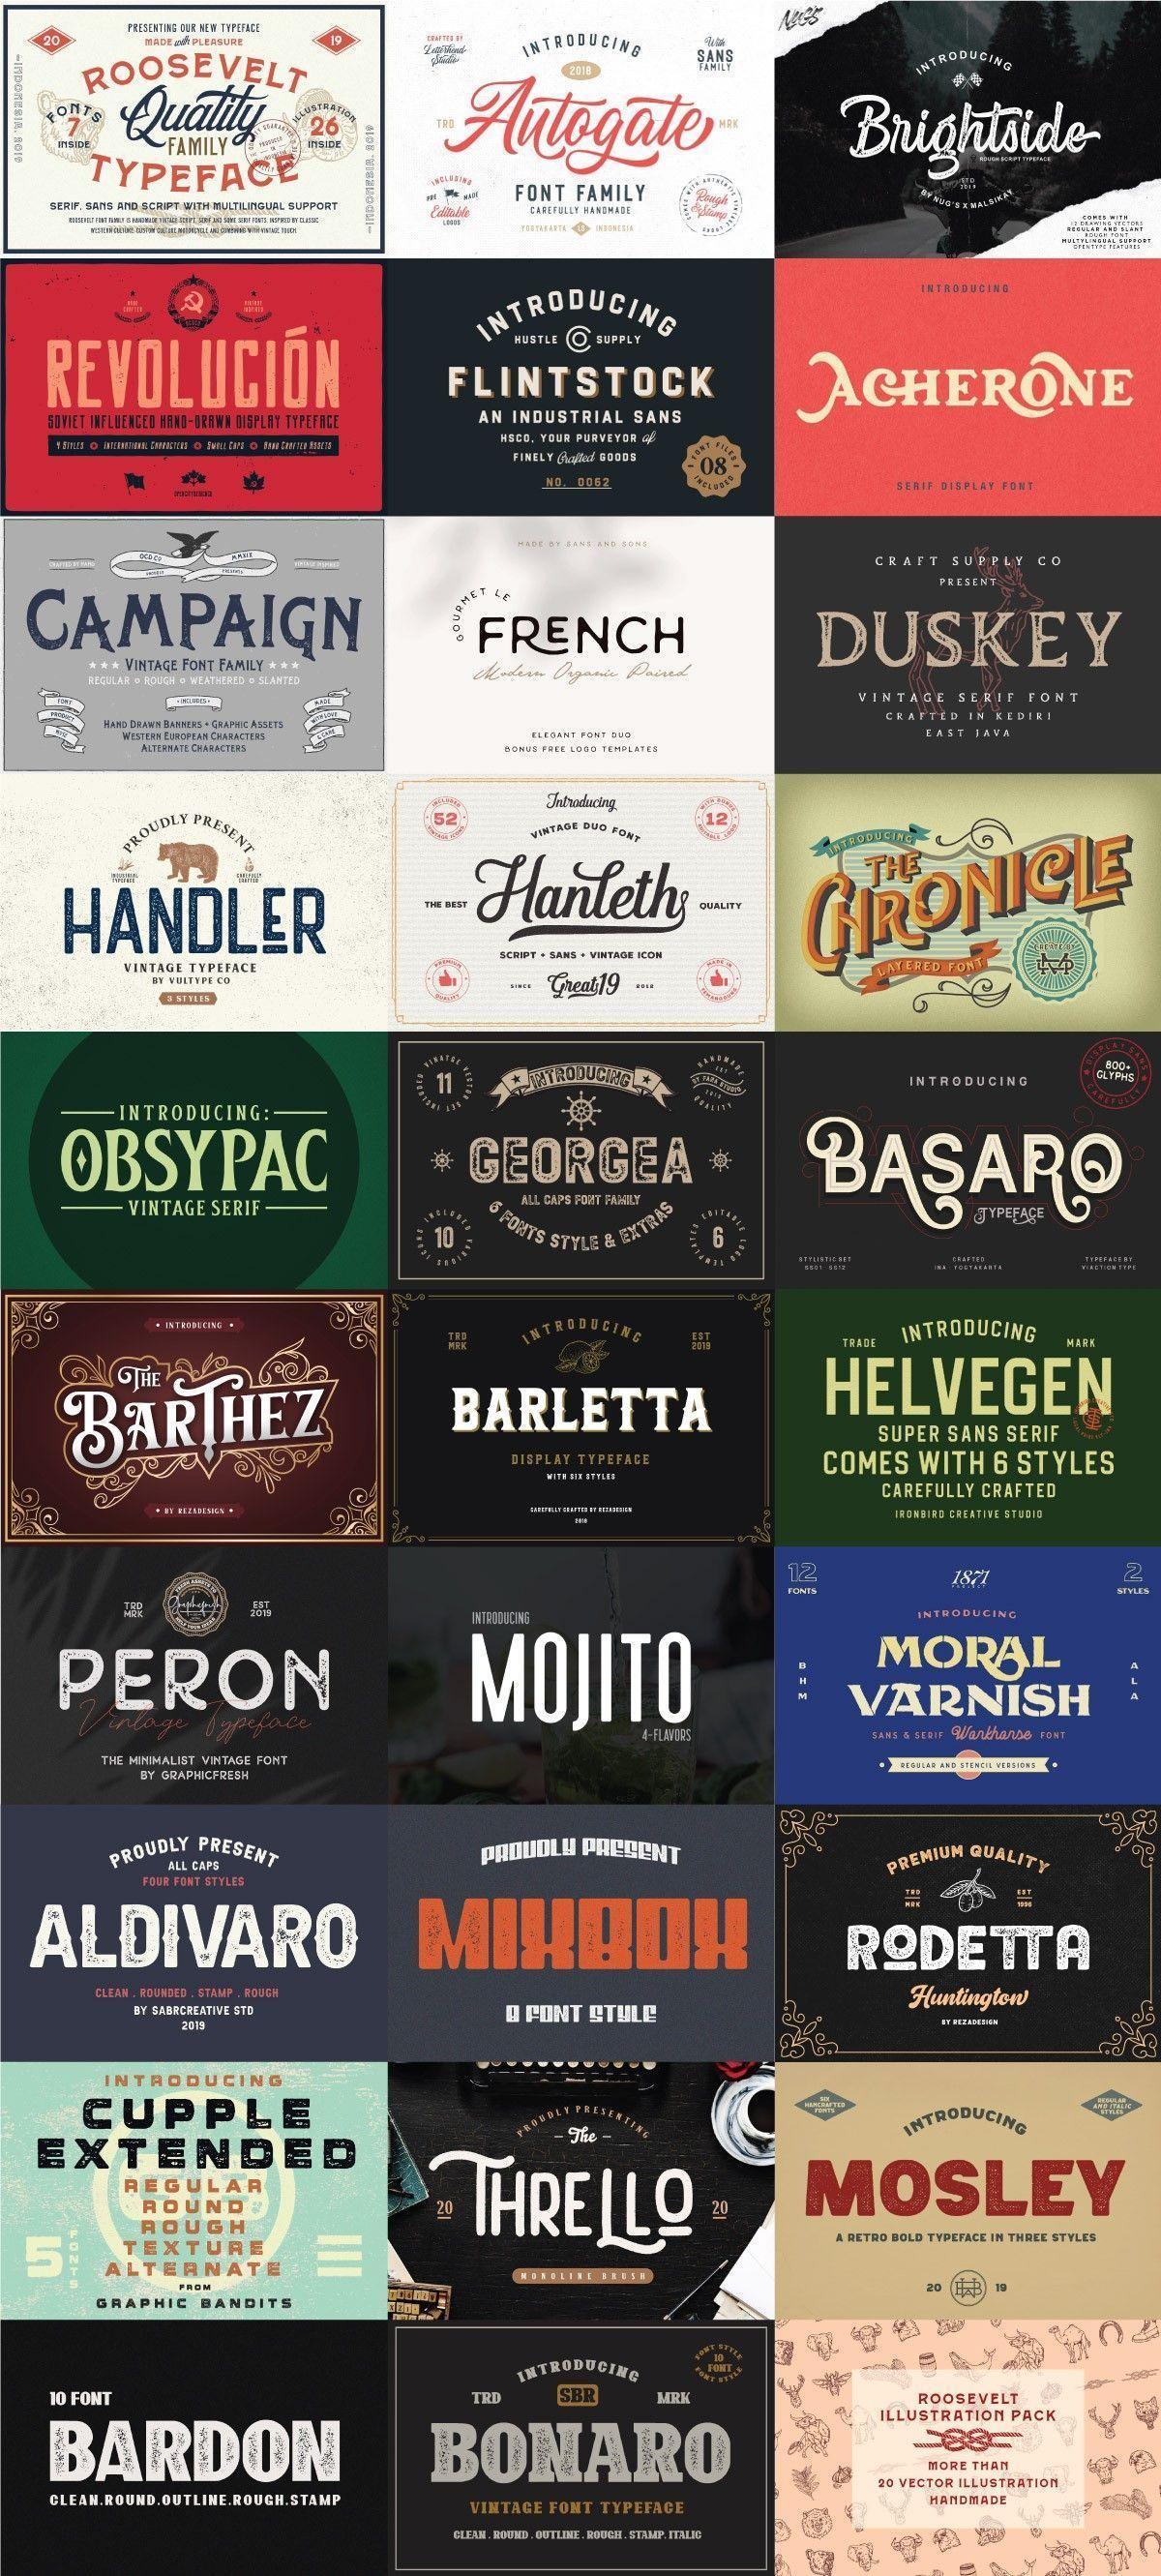 The Ultimate Vintage Font Collection Ad Vintage Fonts Vintage Typography Typeface Font